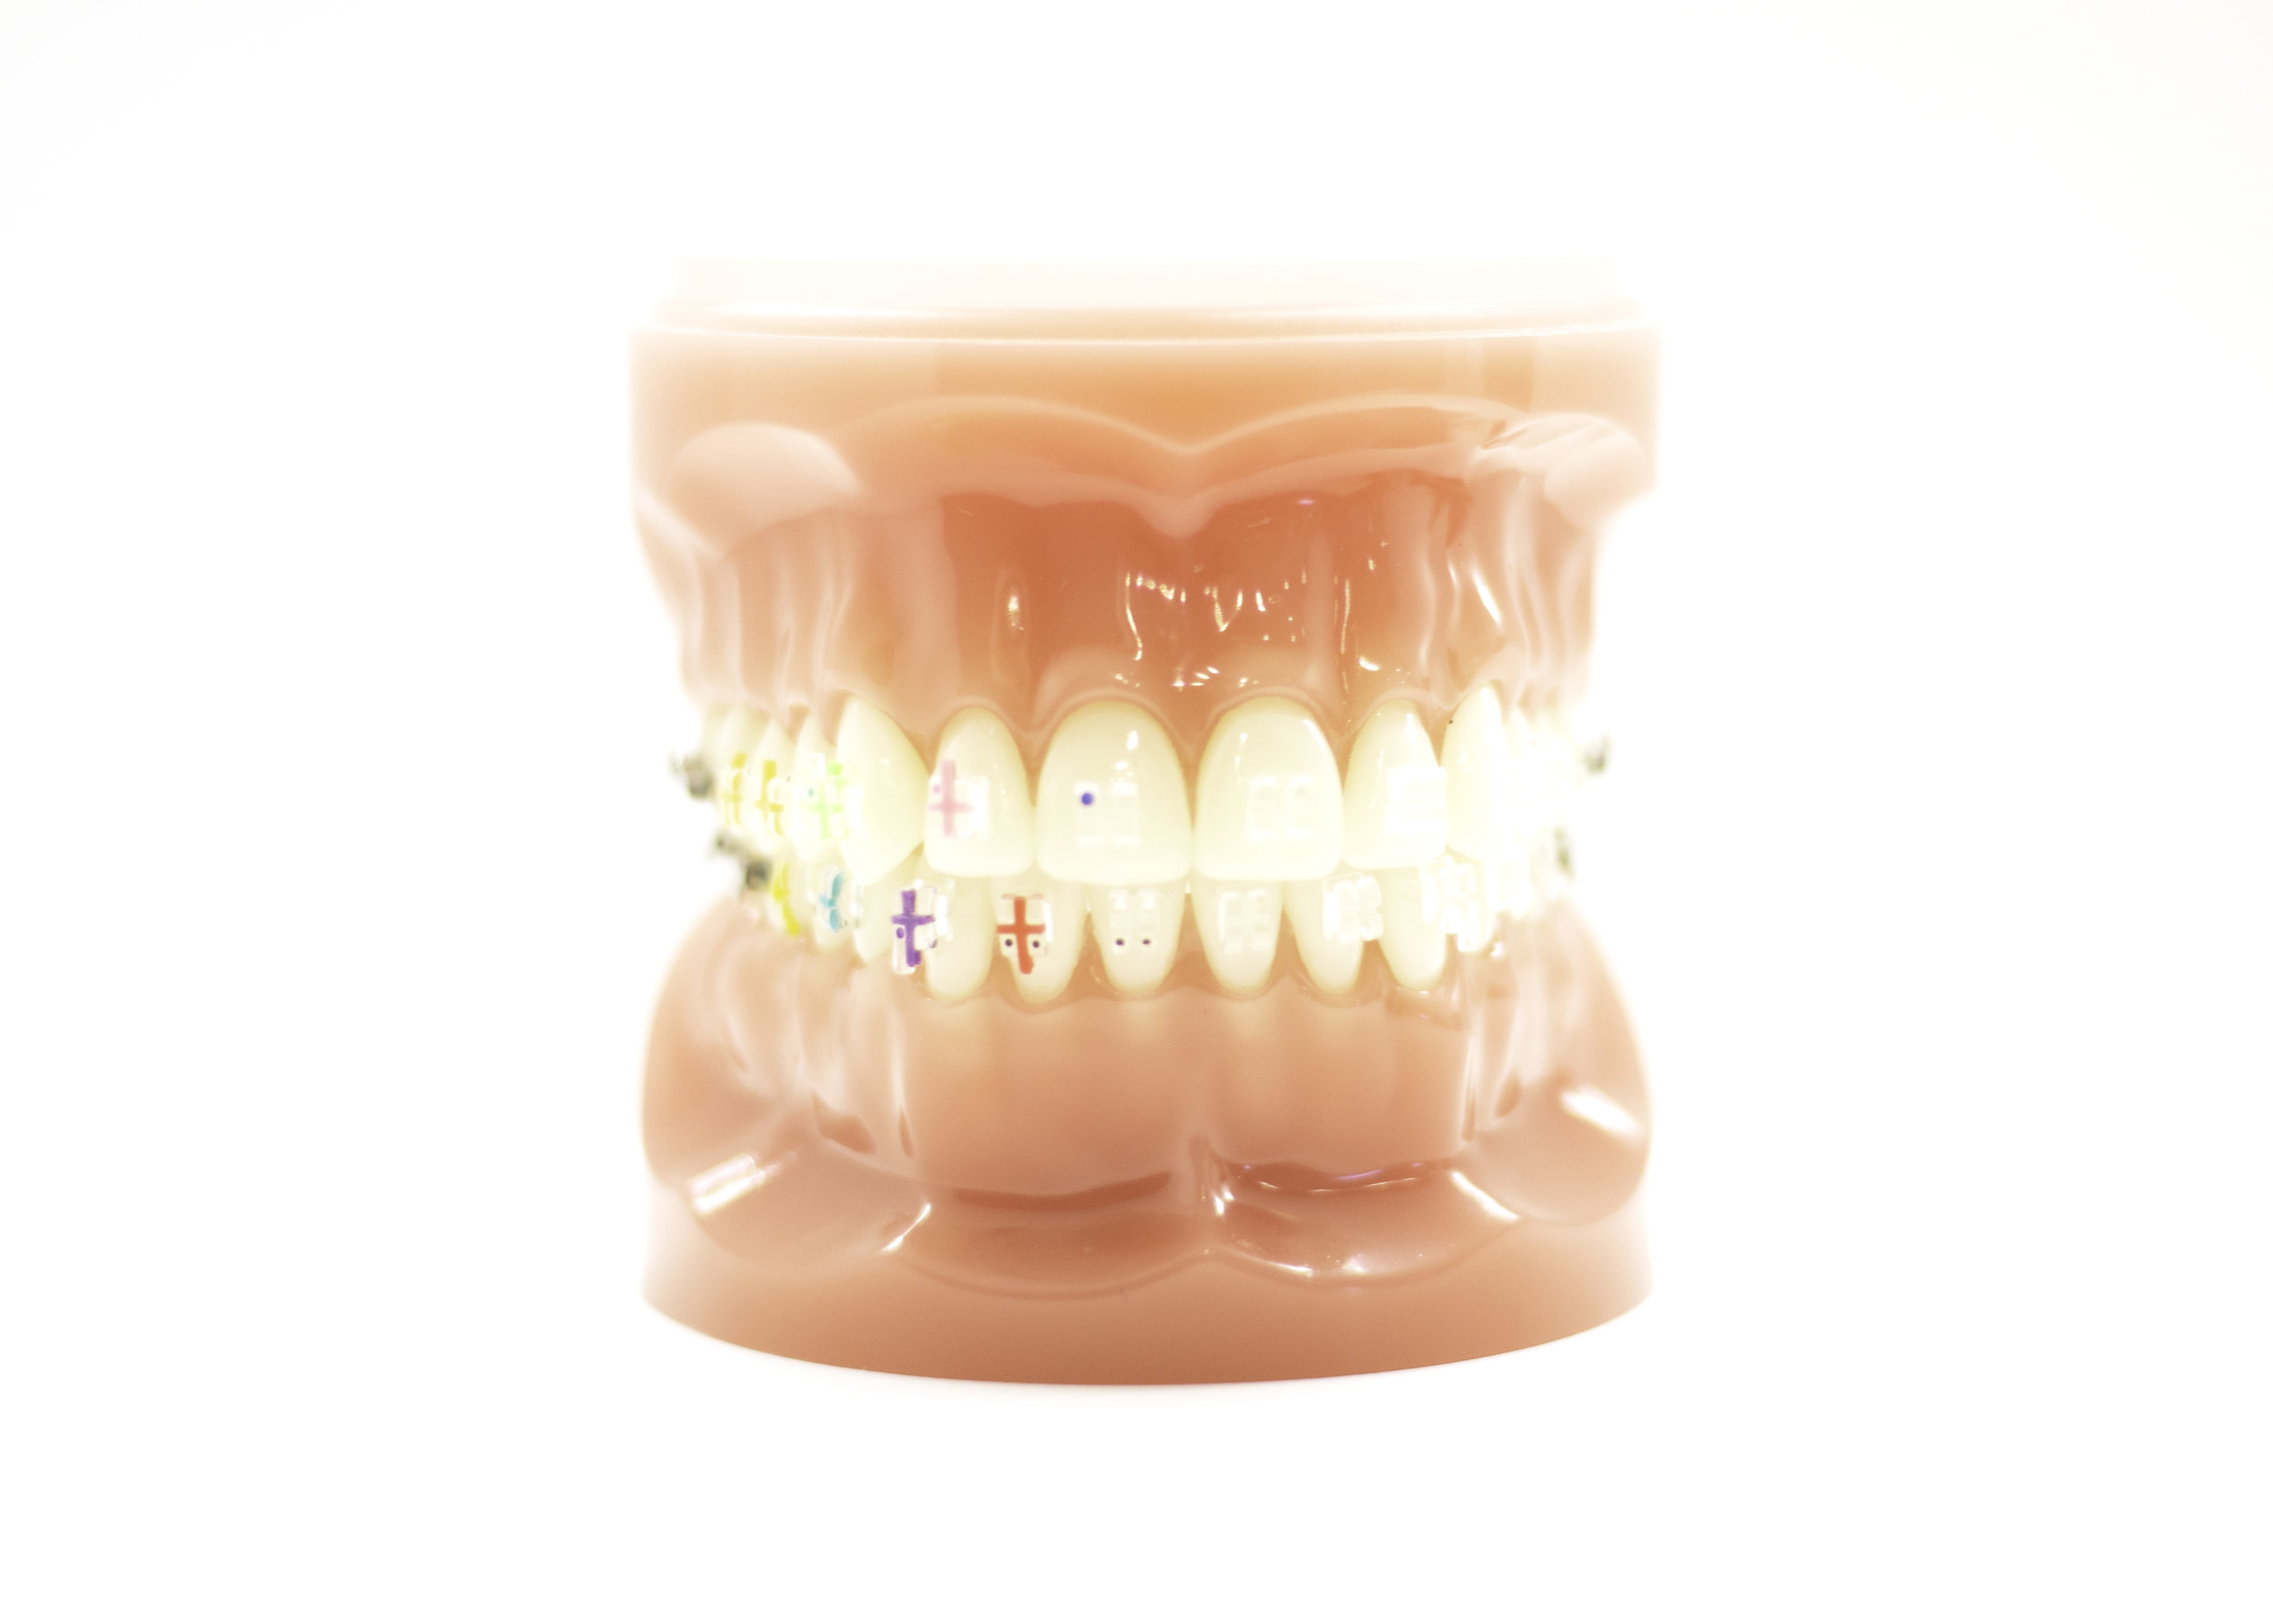 Teeth model with ceramic braces